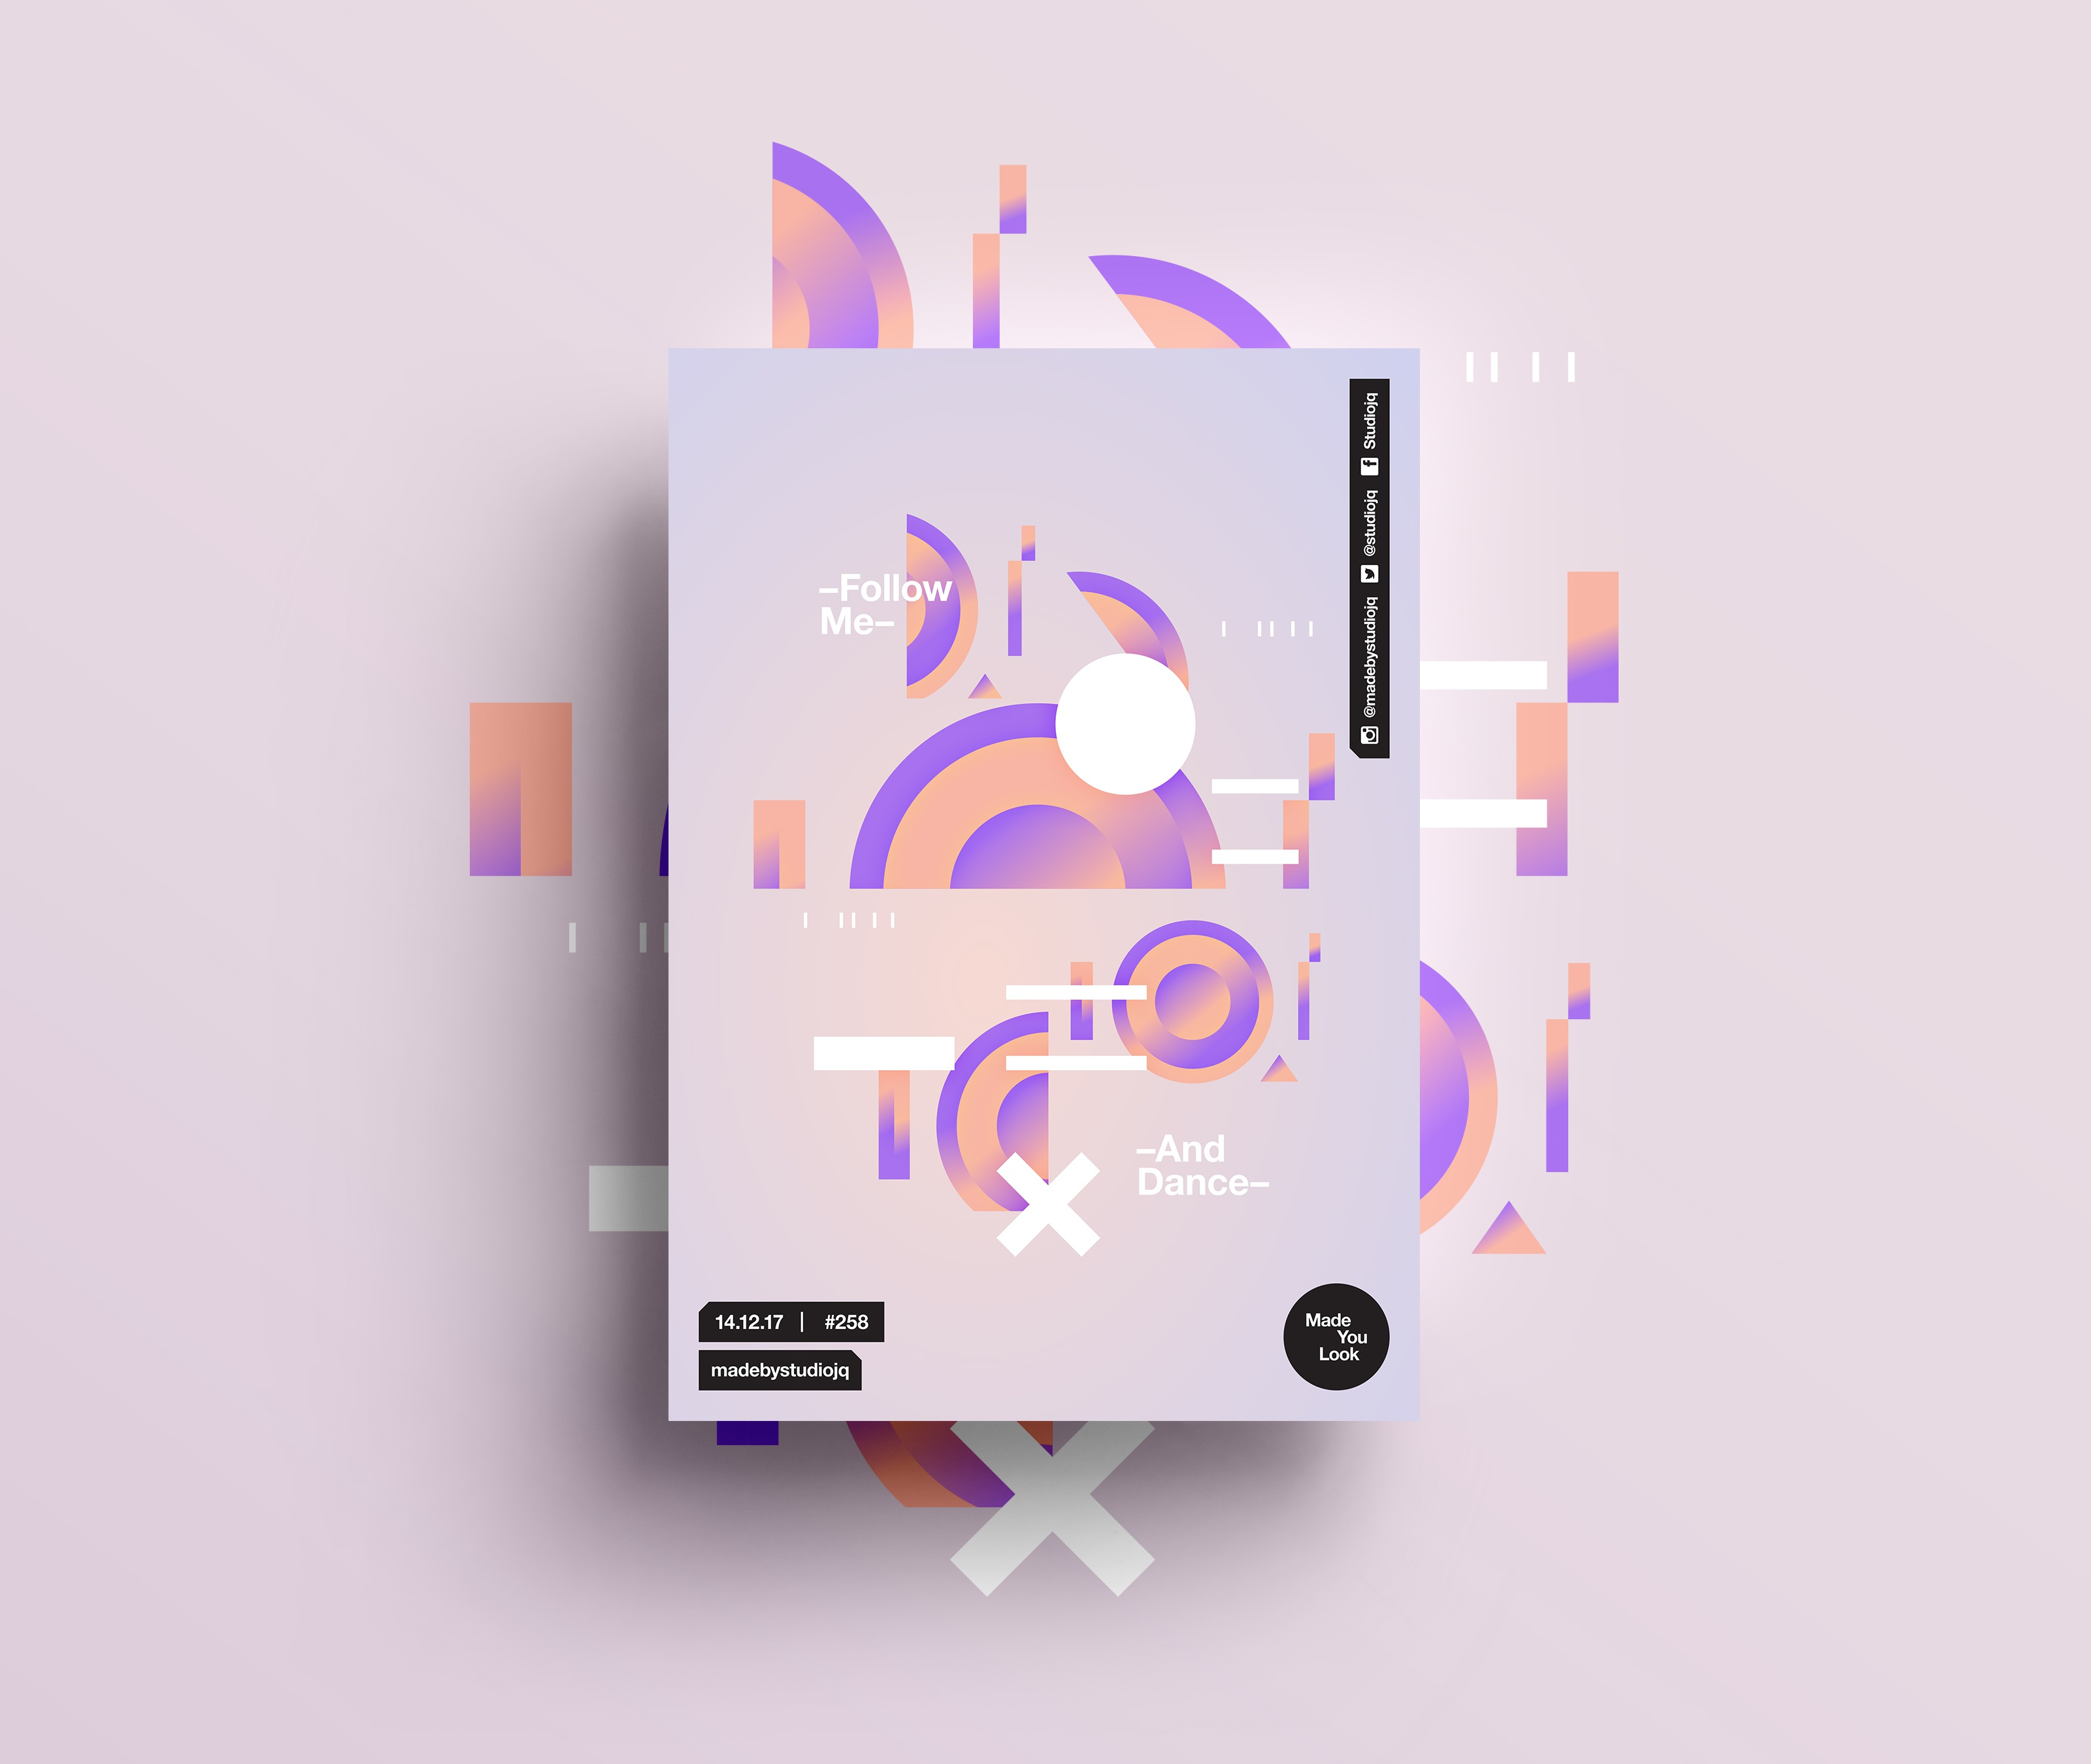 Studiojq2017 posters2017 258